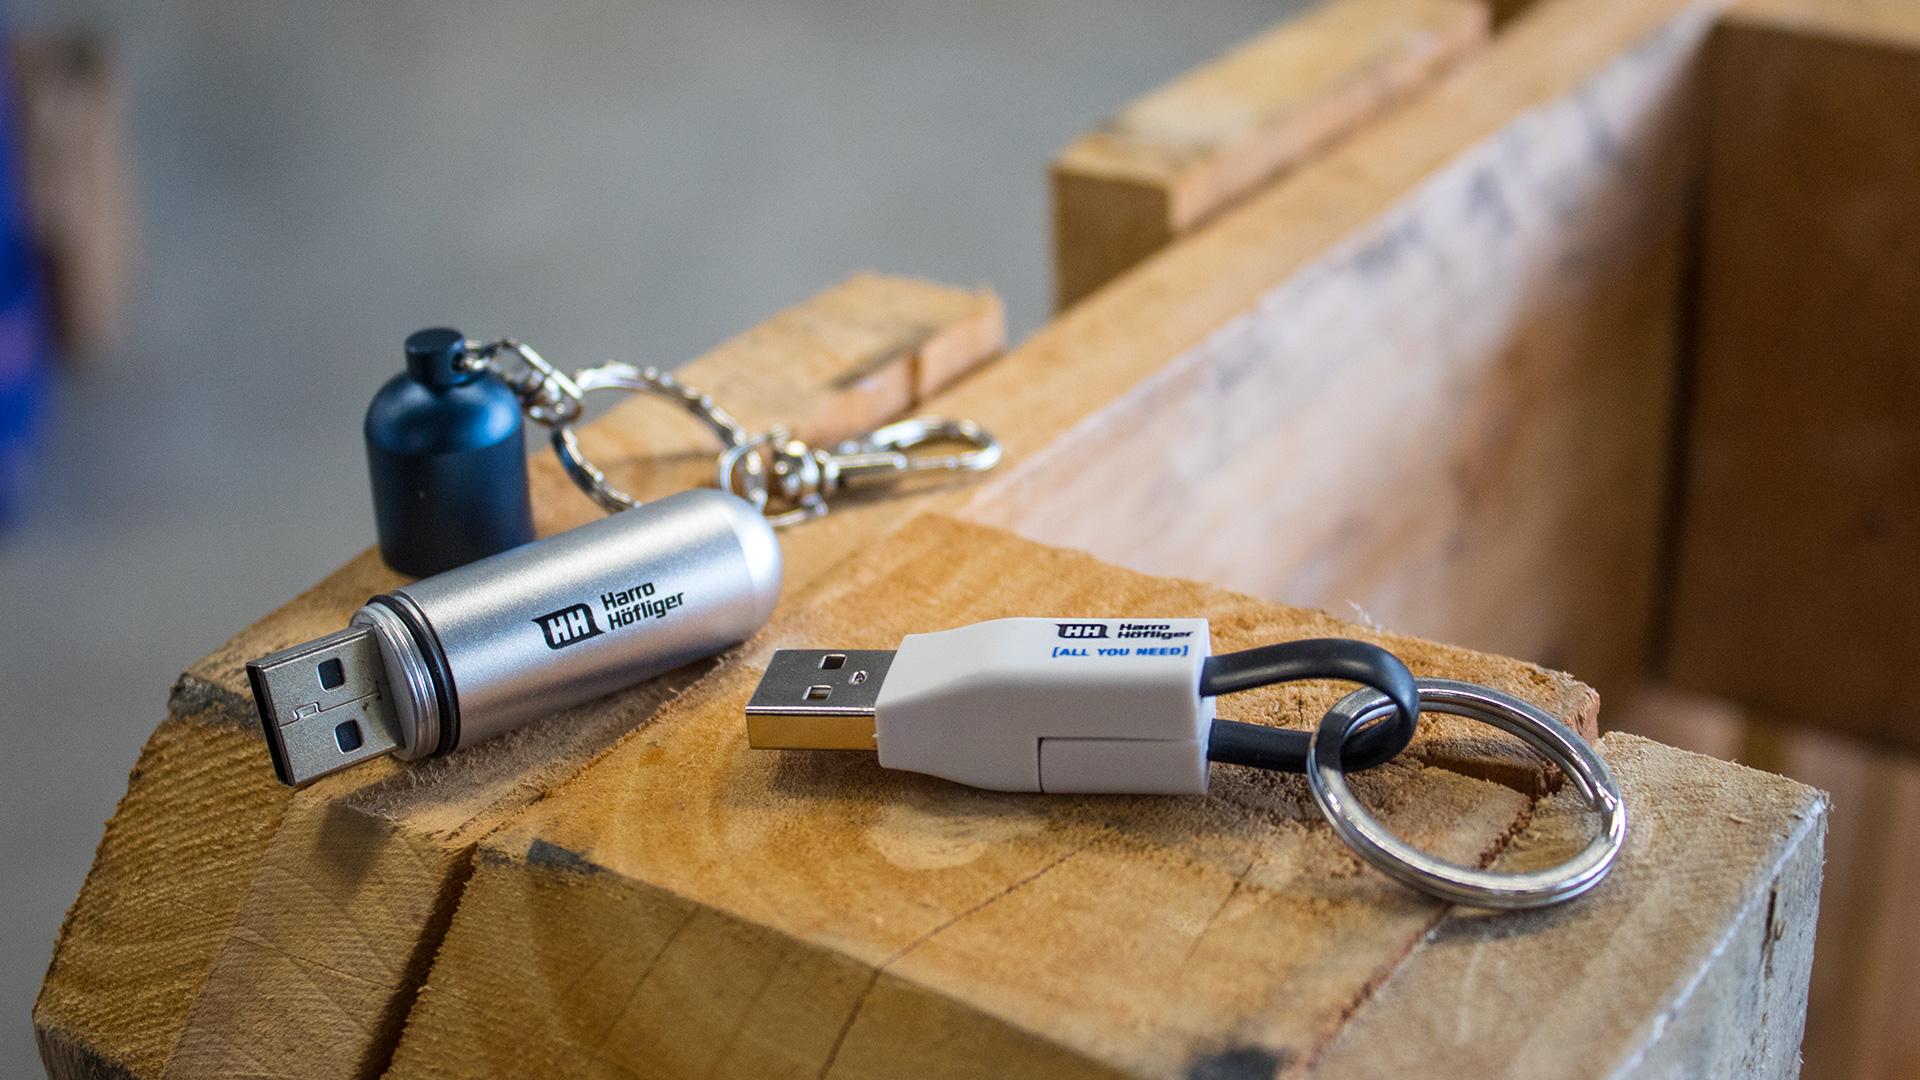 Harro Höfliger Kollektion Werbeartikel USB Stick Full Service